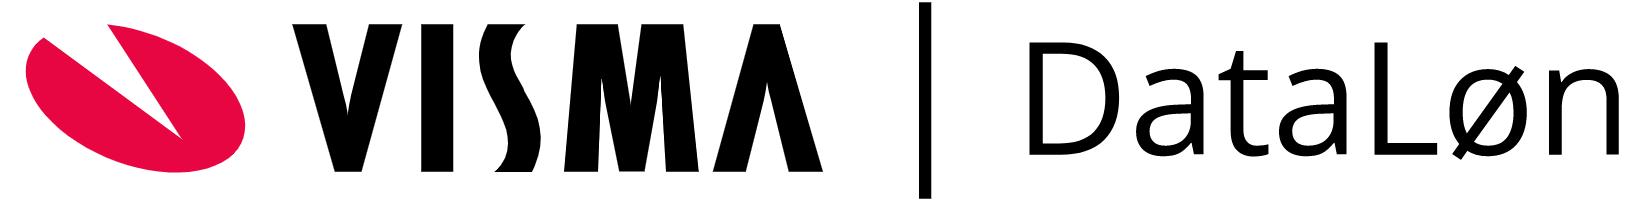 visma-dataloen-logo